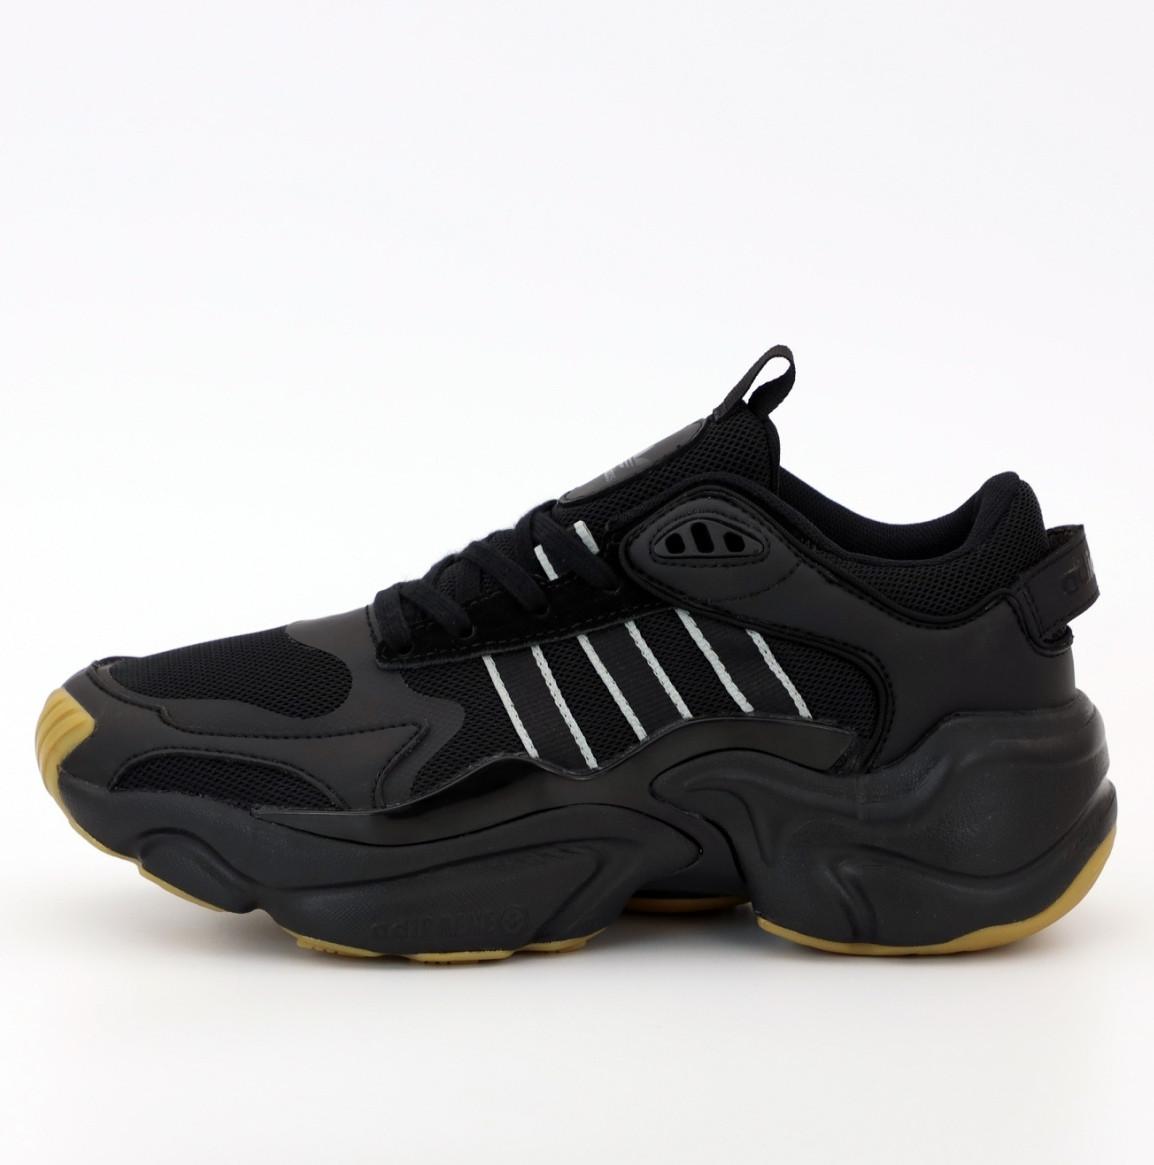 Мужские кроссовки Adidas Consortium x Naked Magmur Runner Black (Адидас Магмур)